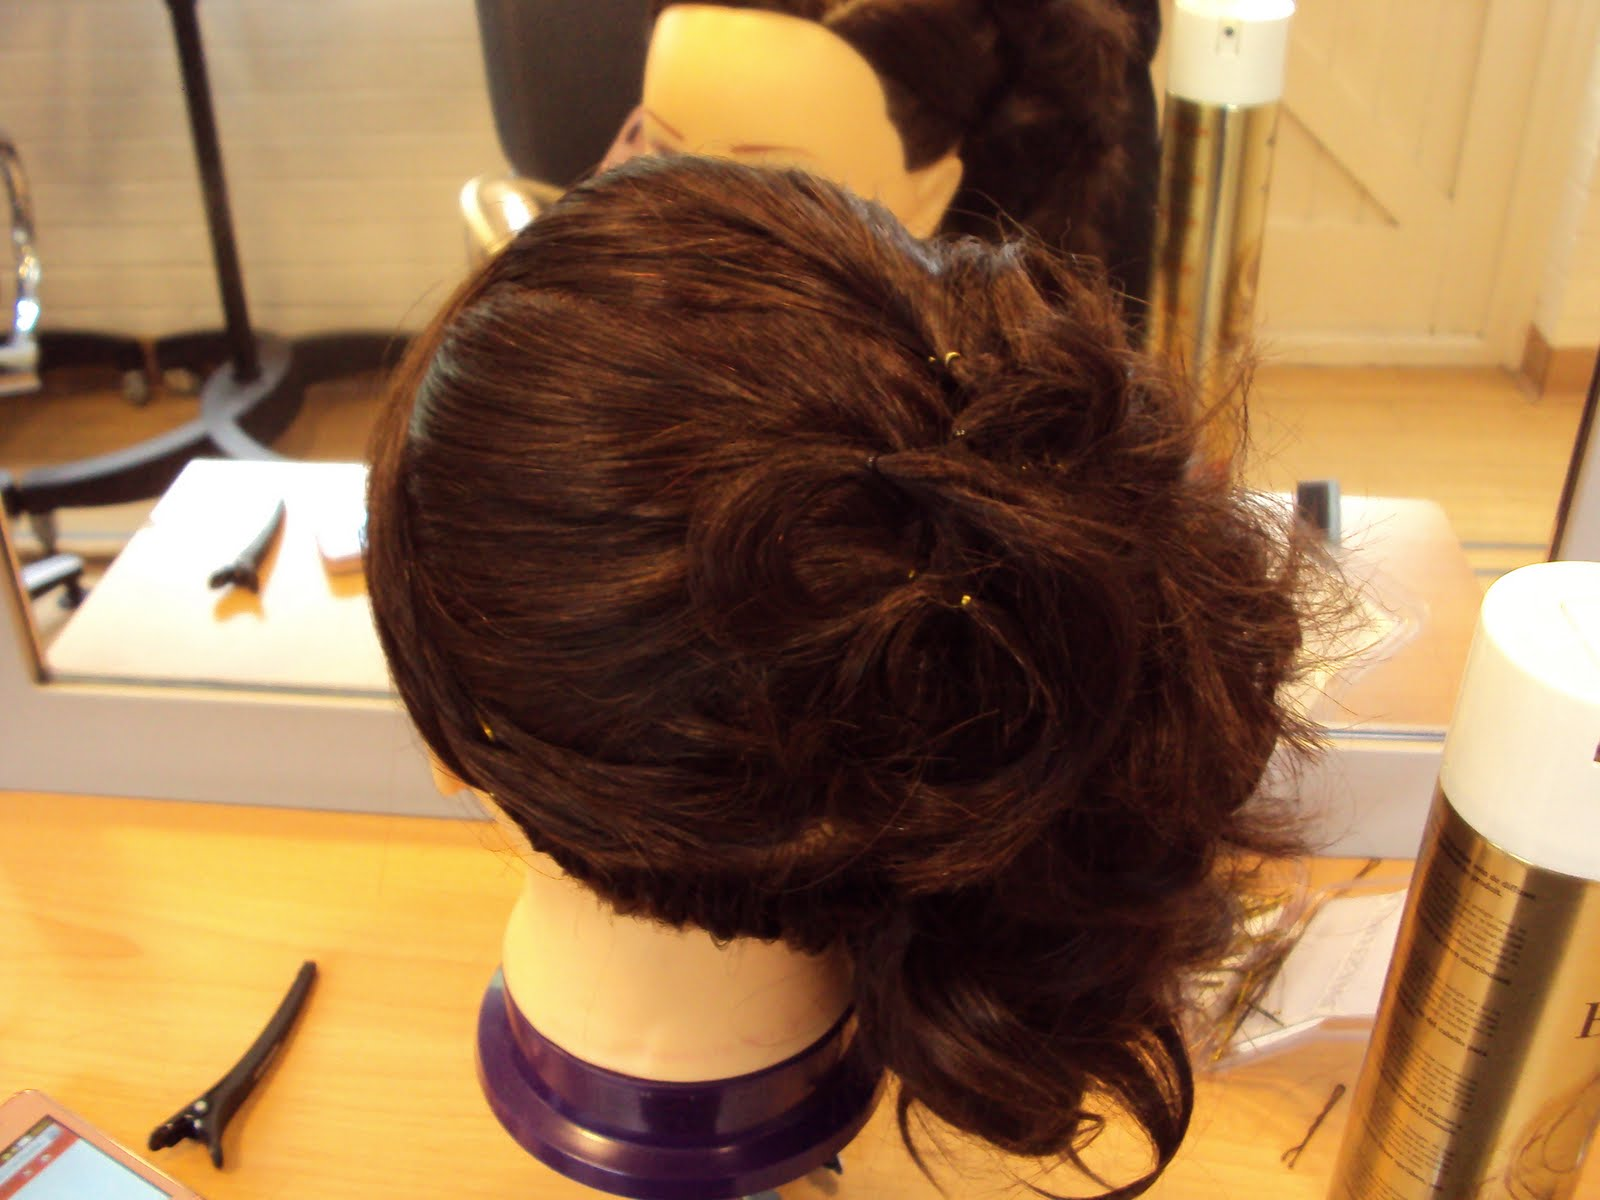 Hair put ups pictures Hair Salon Images, Stock Photos Vectors Shutterstock